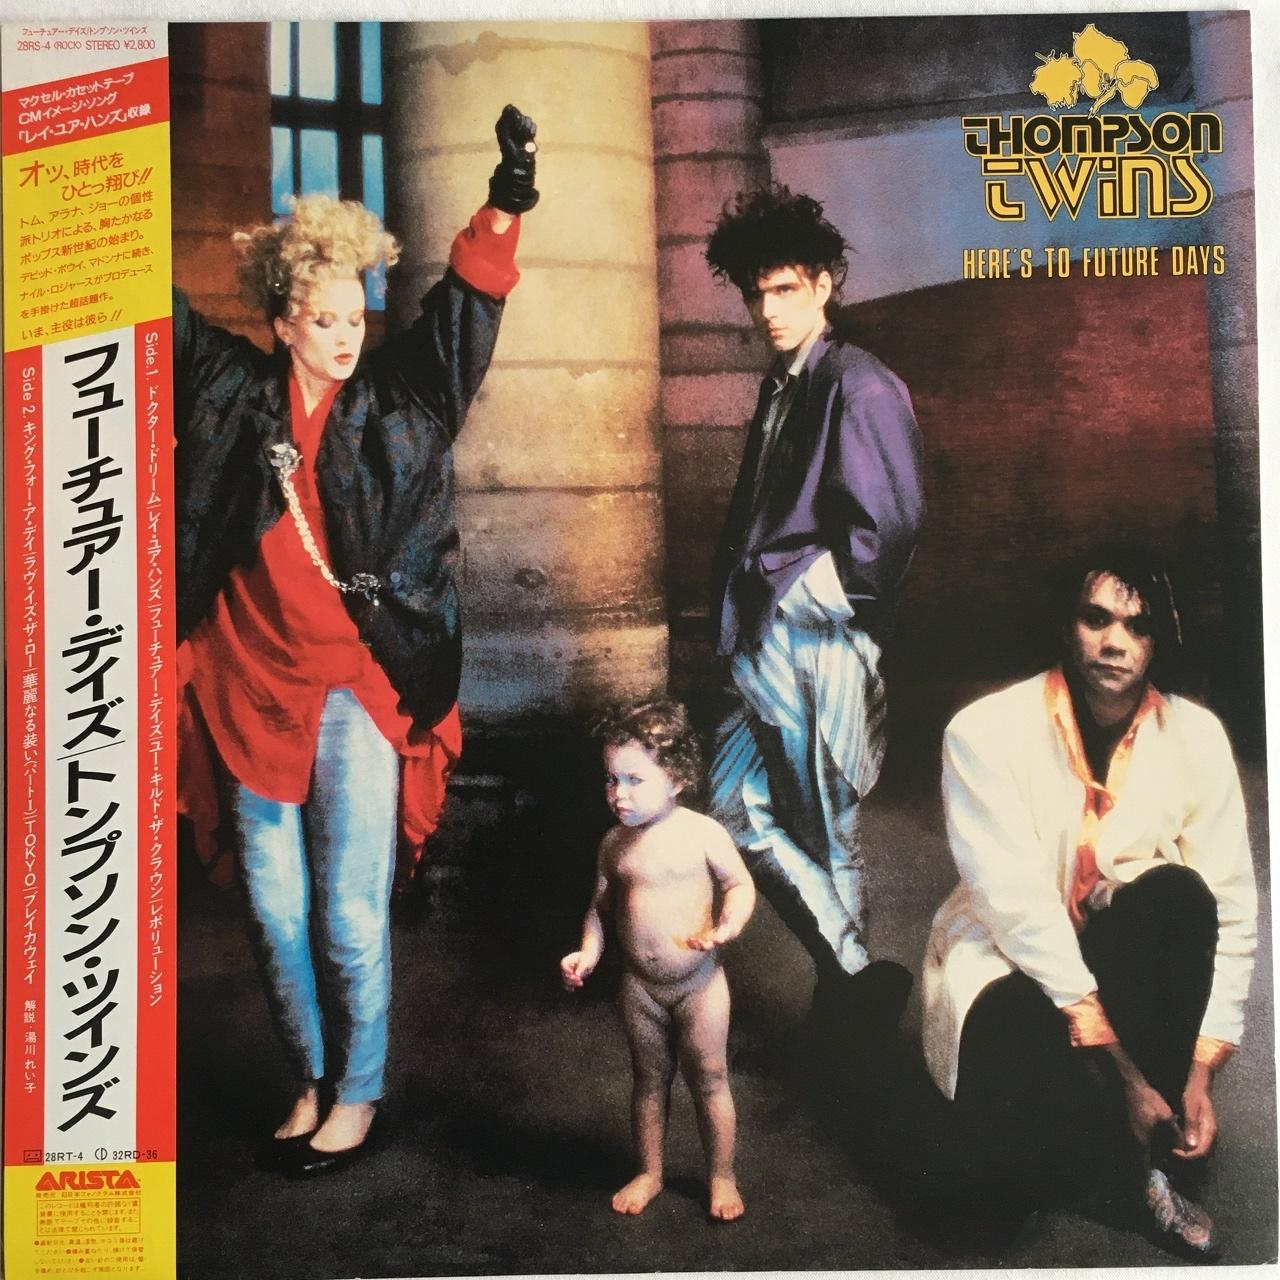 【LP・国内盤】トンプソン・ツインズ / フューチュアー・デイズ